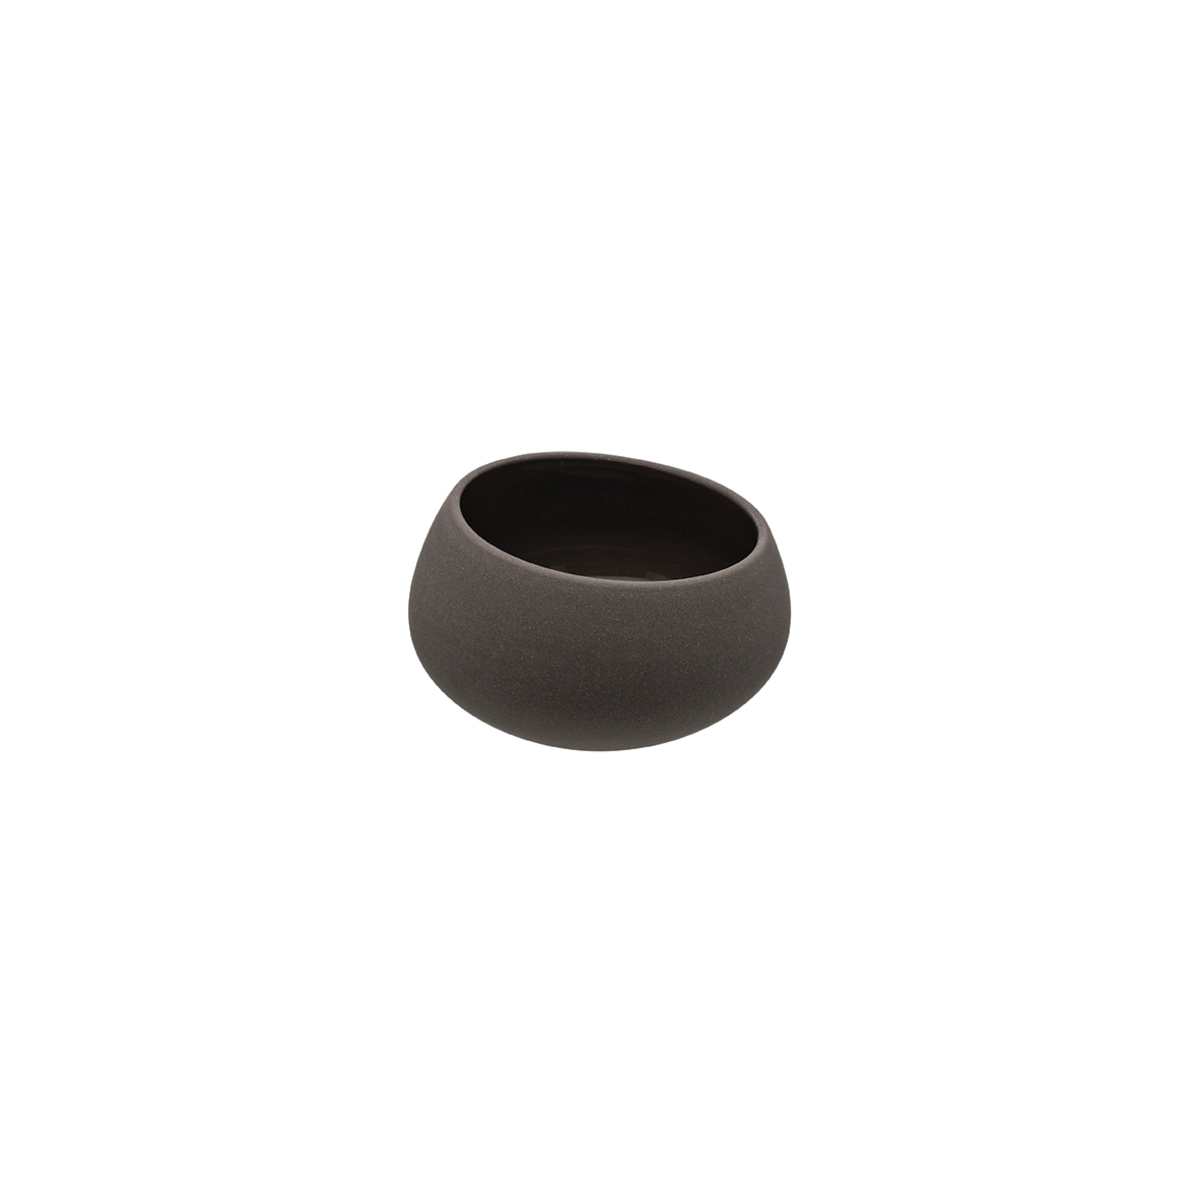 Coupelle ronde basalte grès 7 cl Ø 7,30 cm Bahia Degrenne